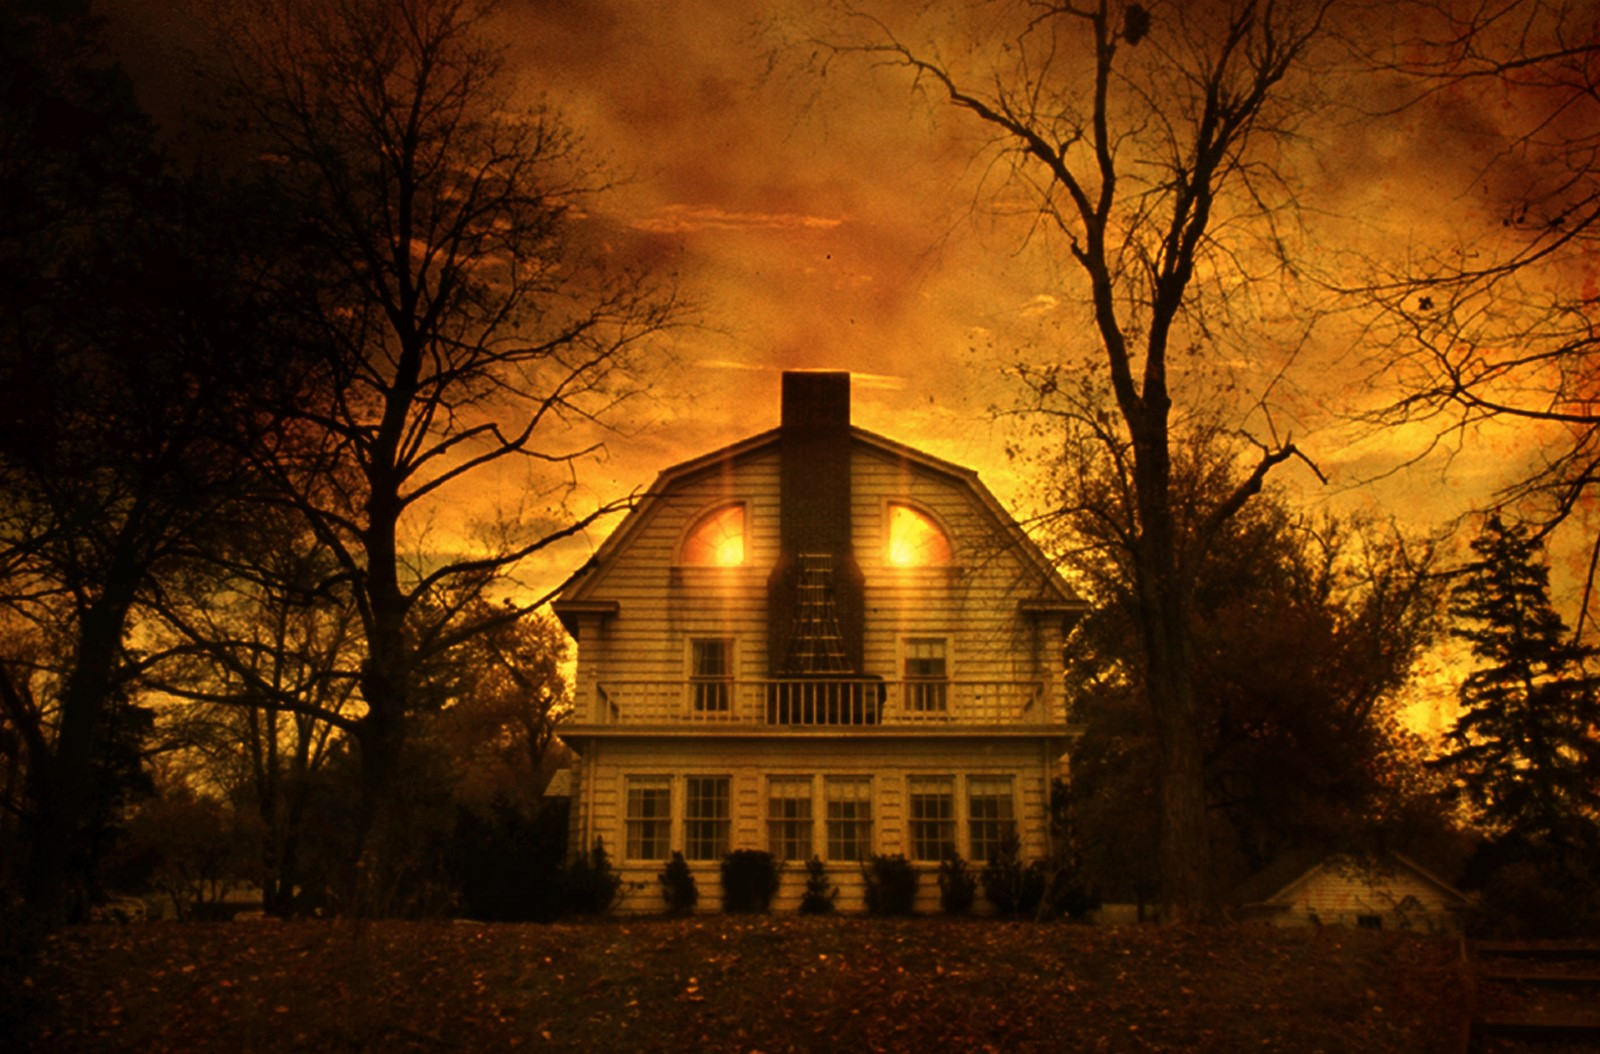 The Amityville Horror house